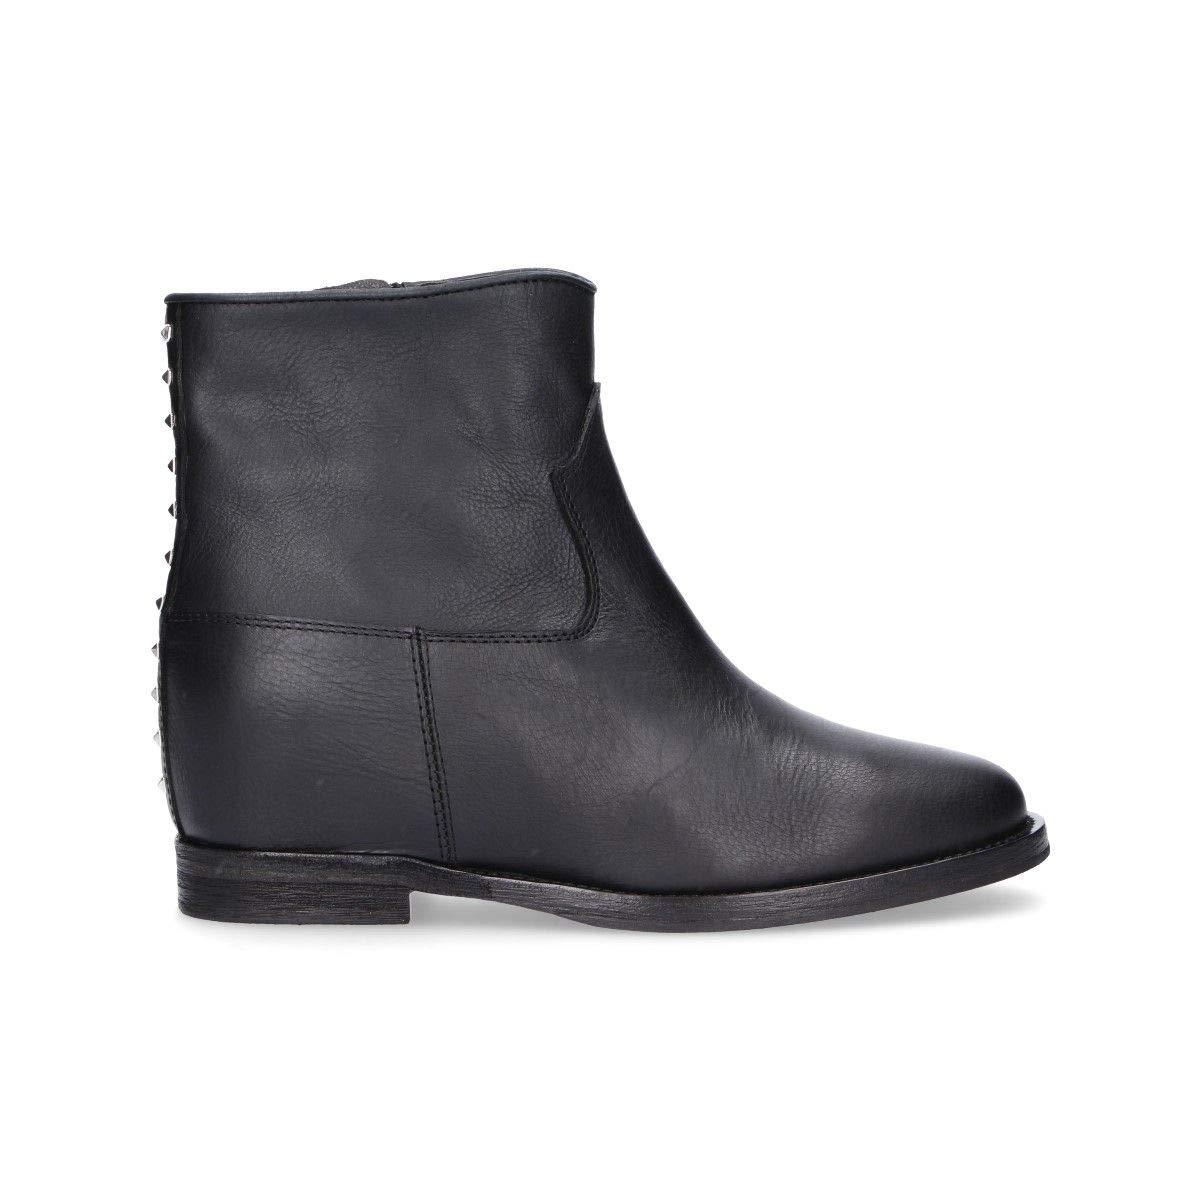 - VIA ROMA 15 Women's V2857BLACK Black Leather Ankle Boots